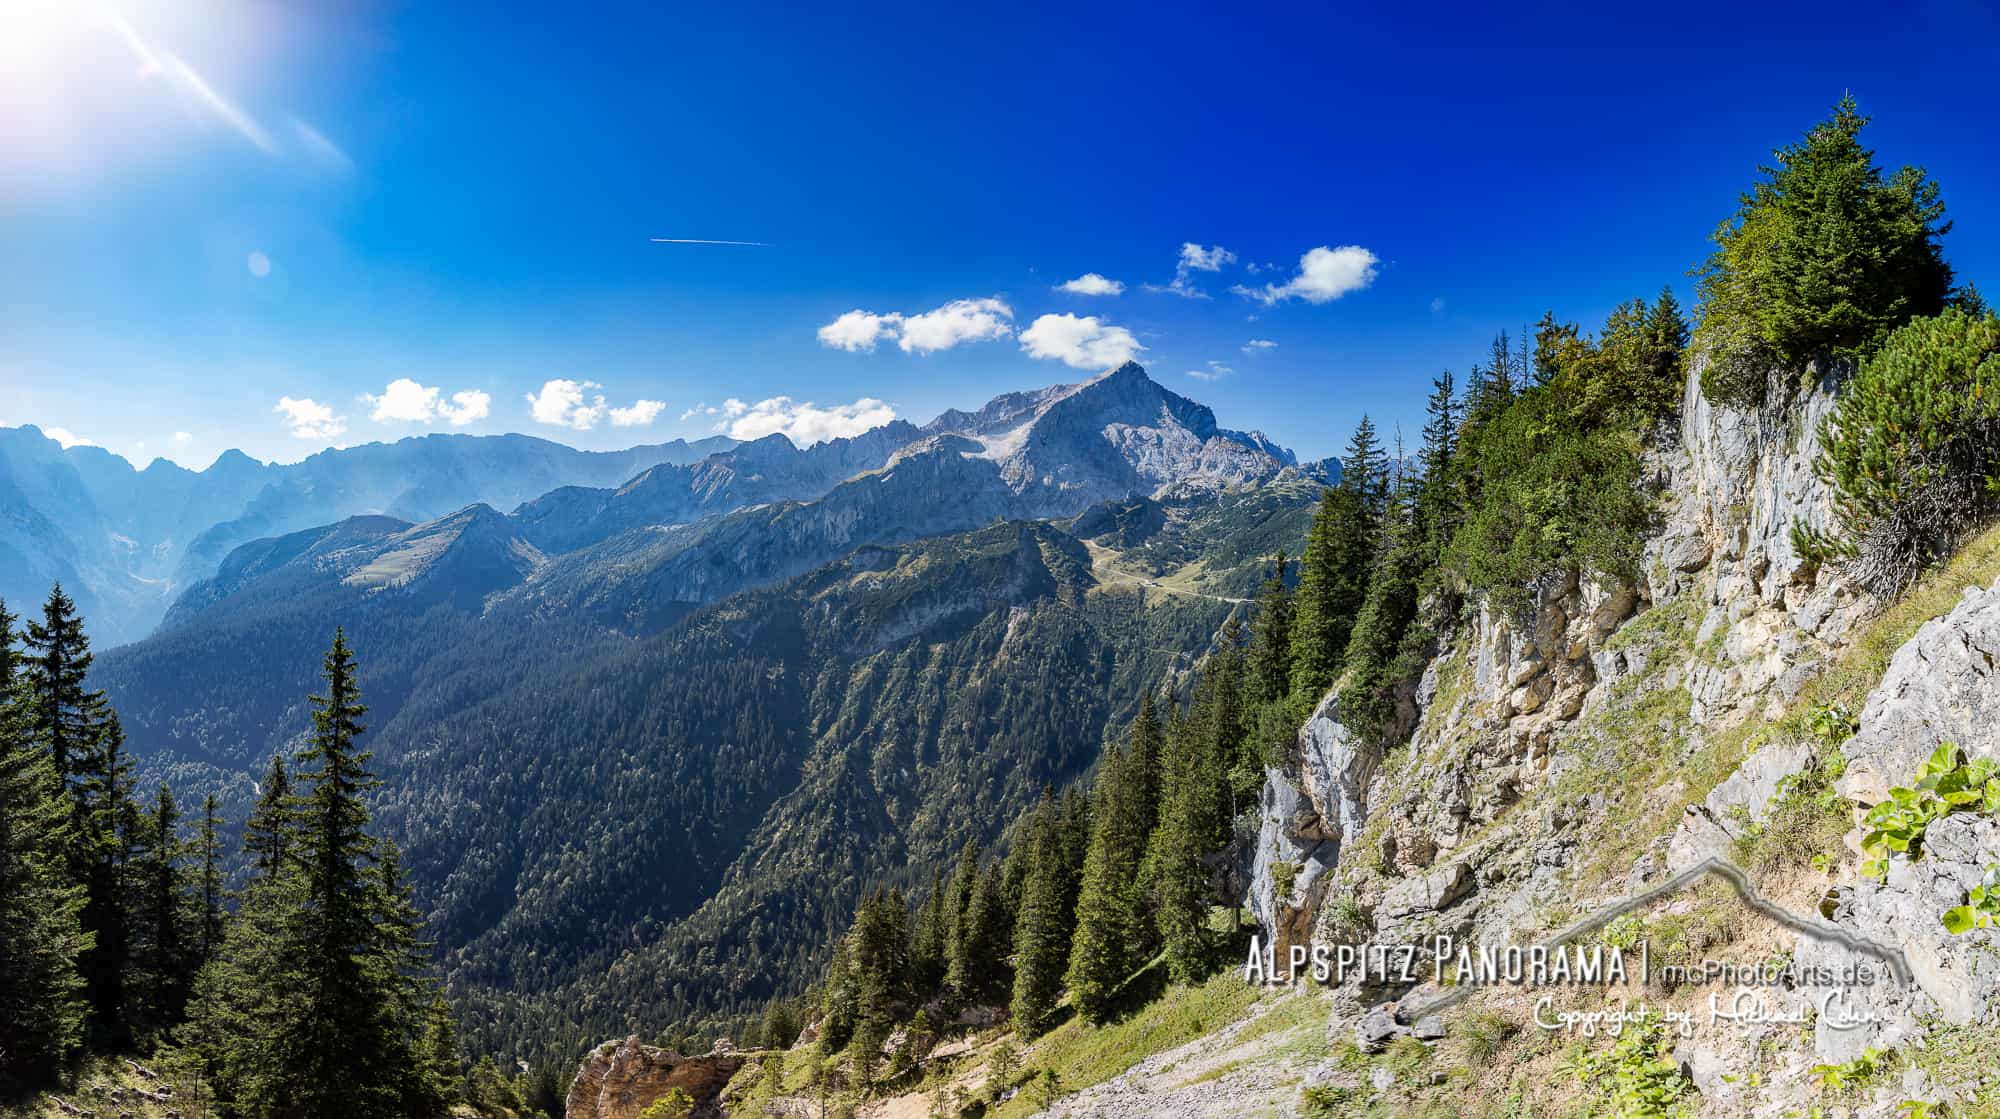 Alpspitz Panorama